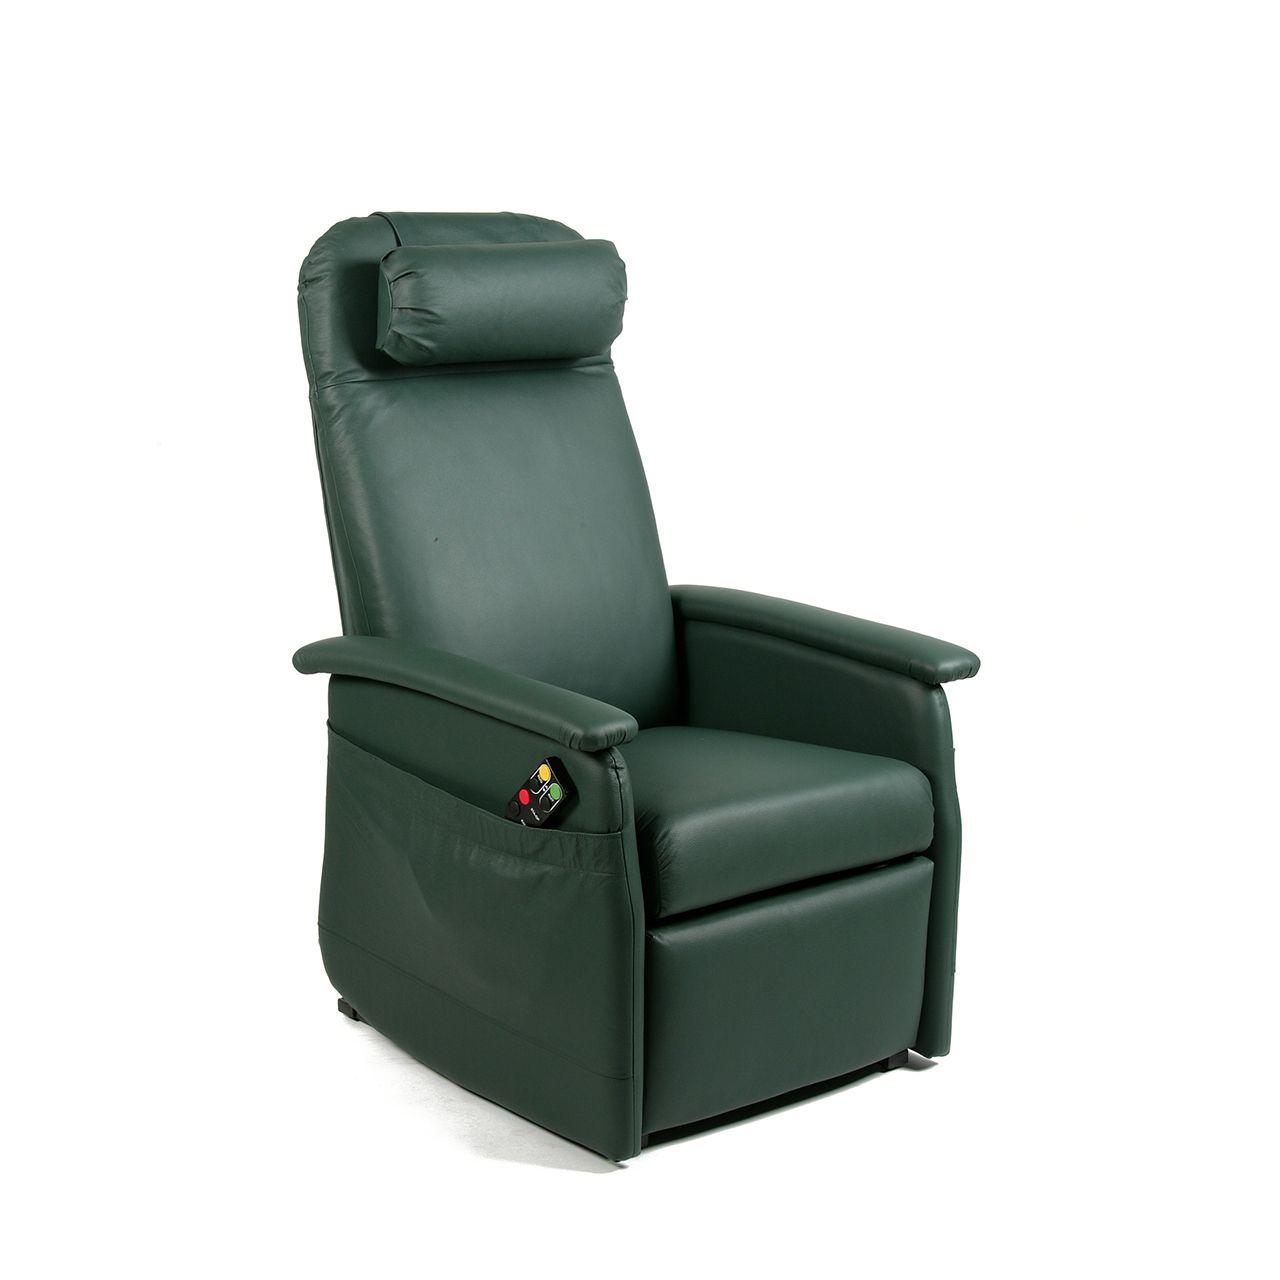 hermes mini sta-op stoel ARTNRNNB Voorkant